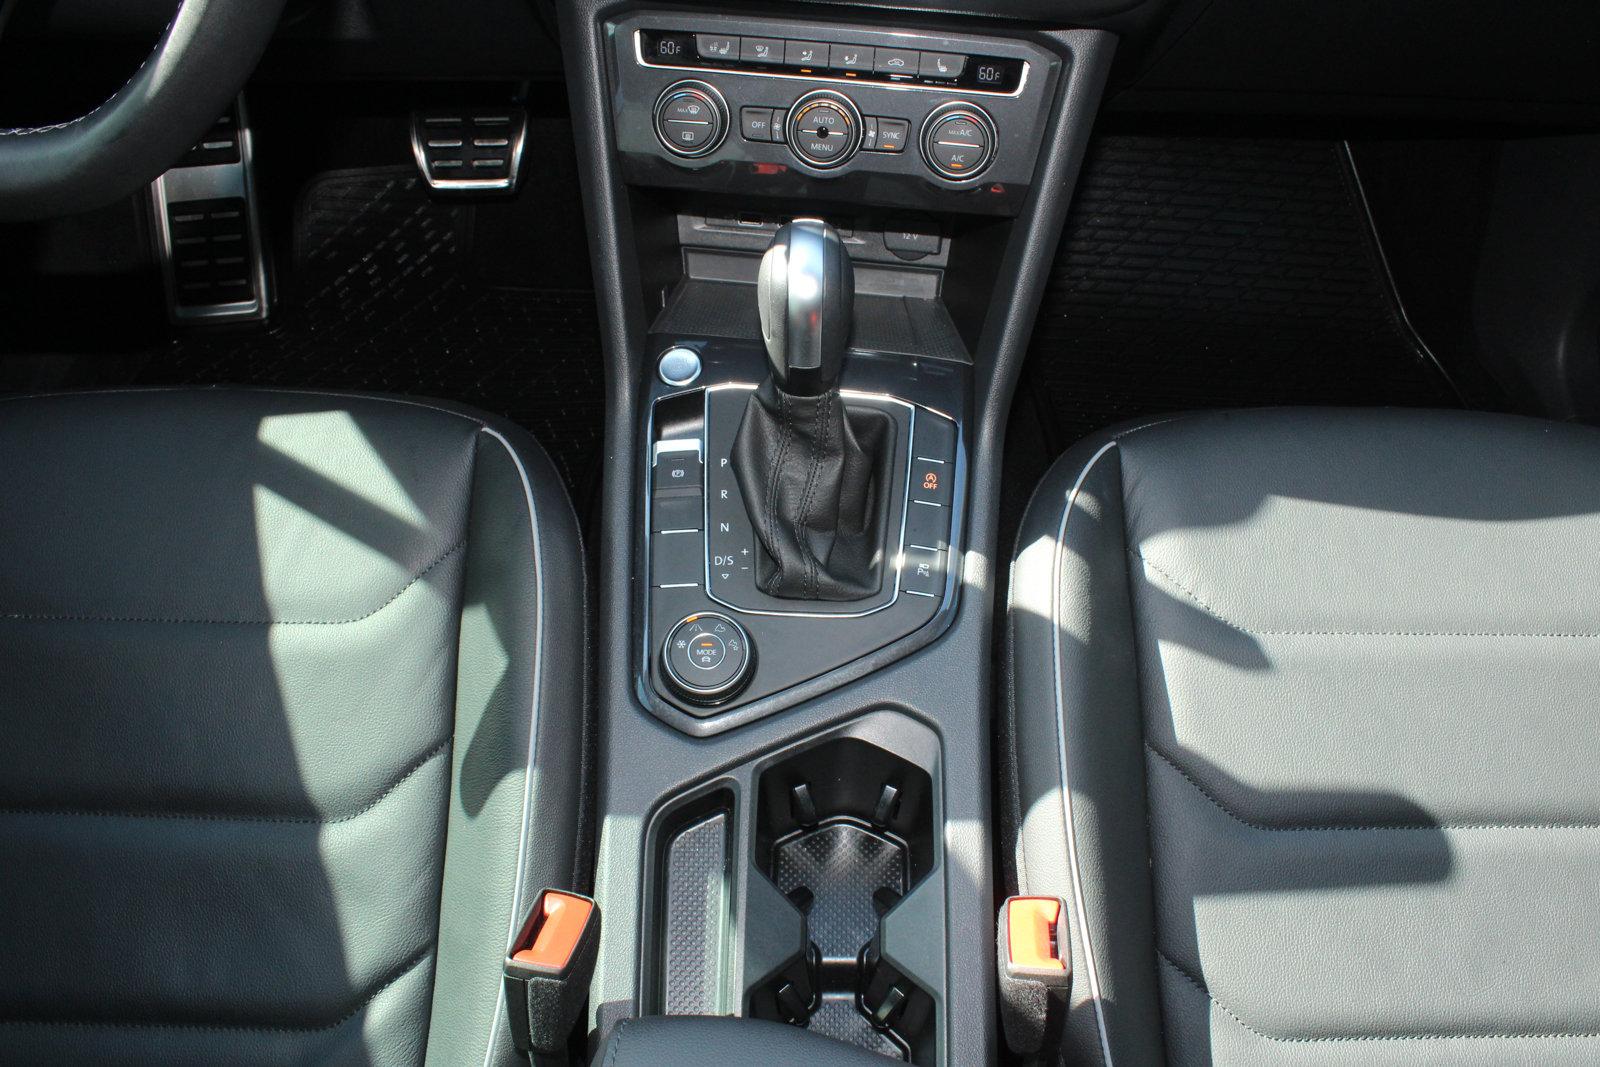 Certified Pre-Owned 2020 Volkswagen Tiguan SEL Premium R-Line